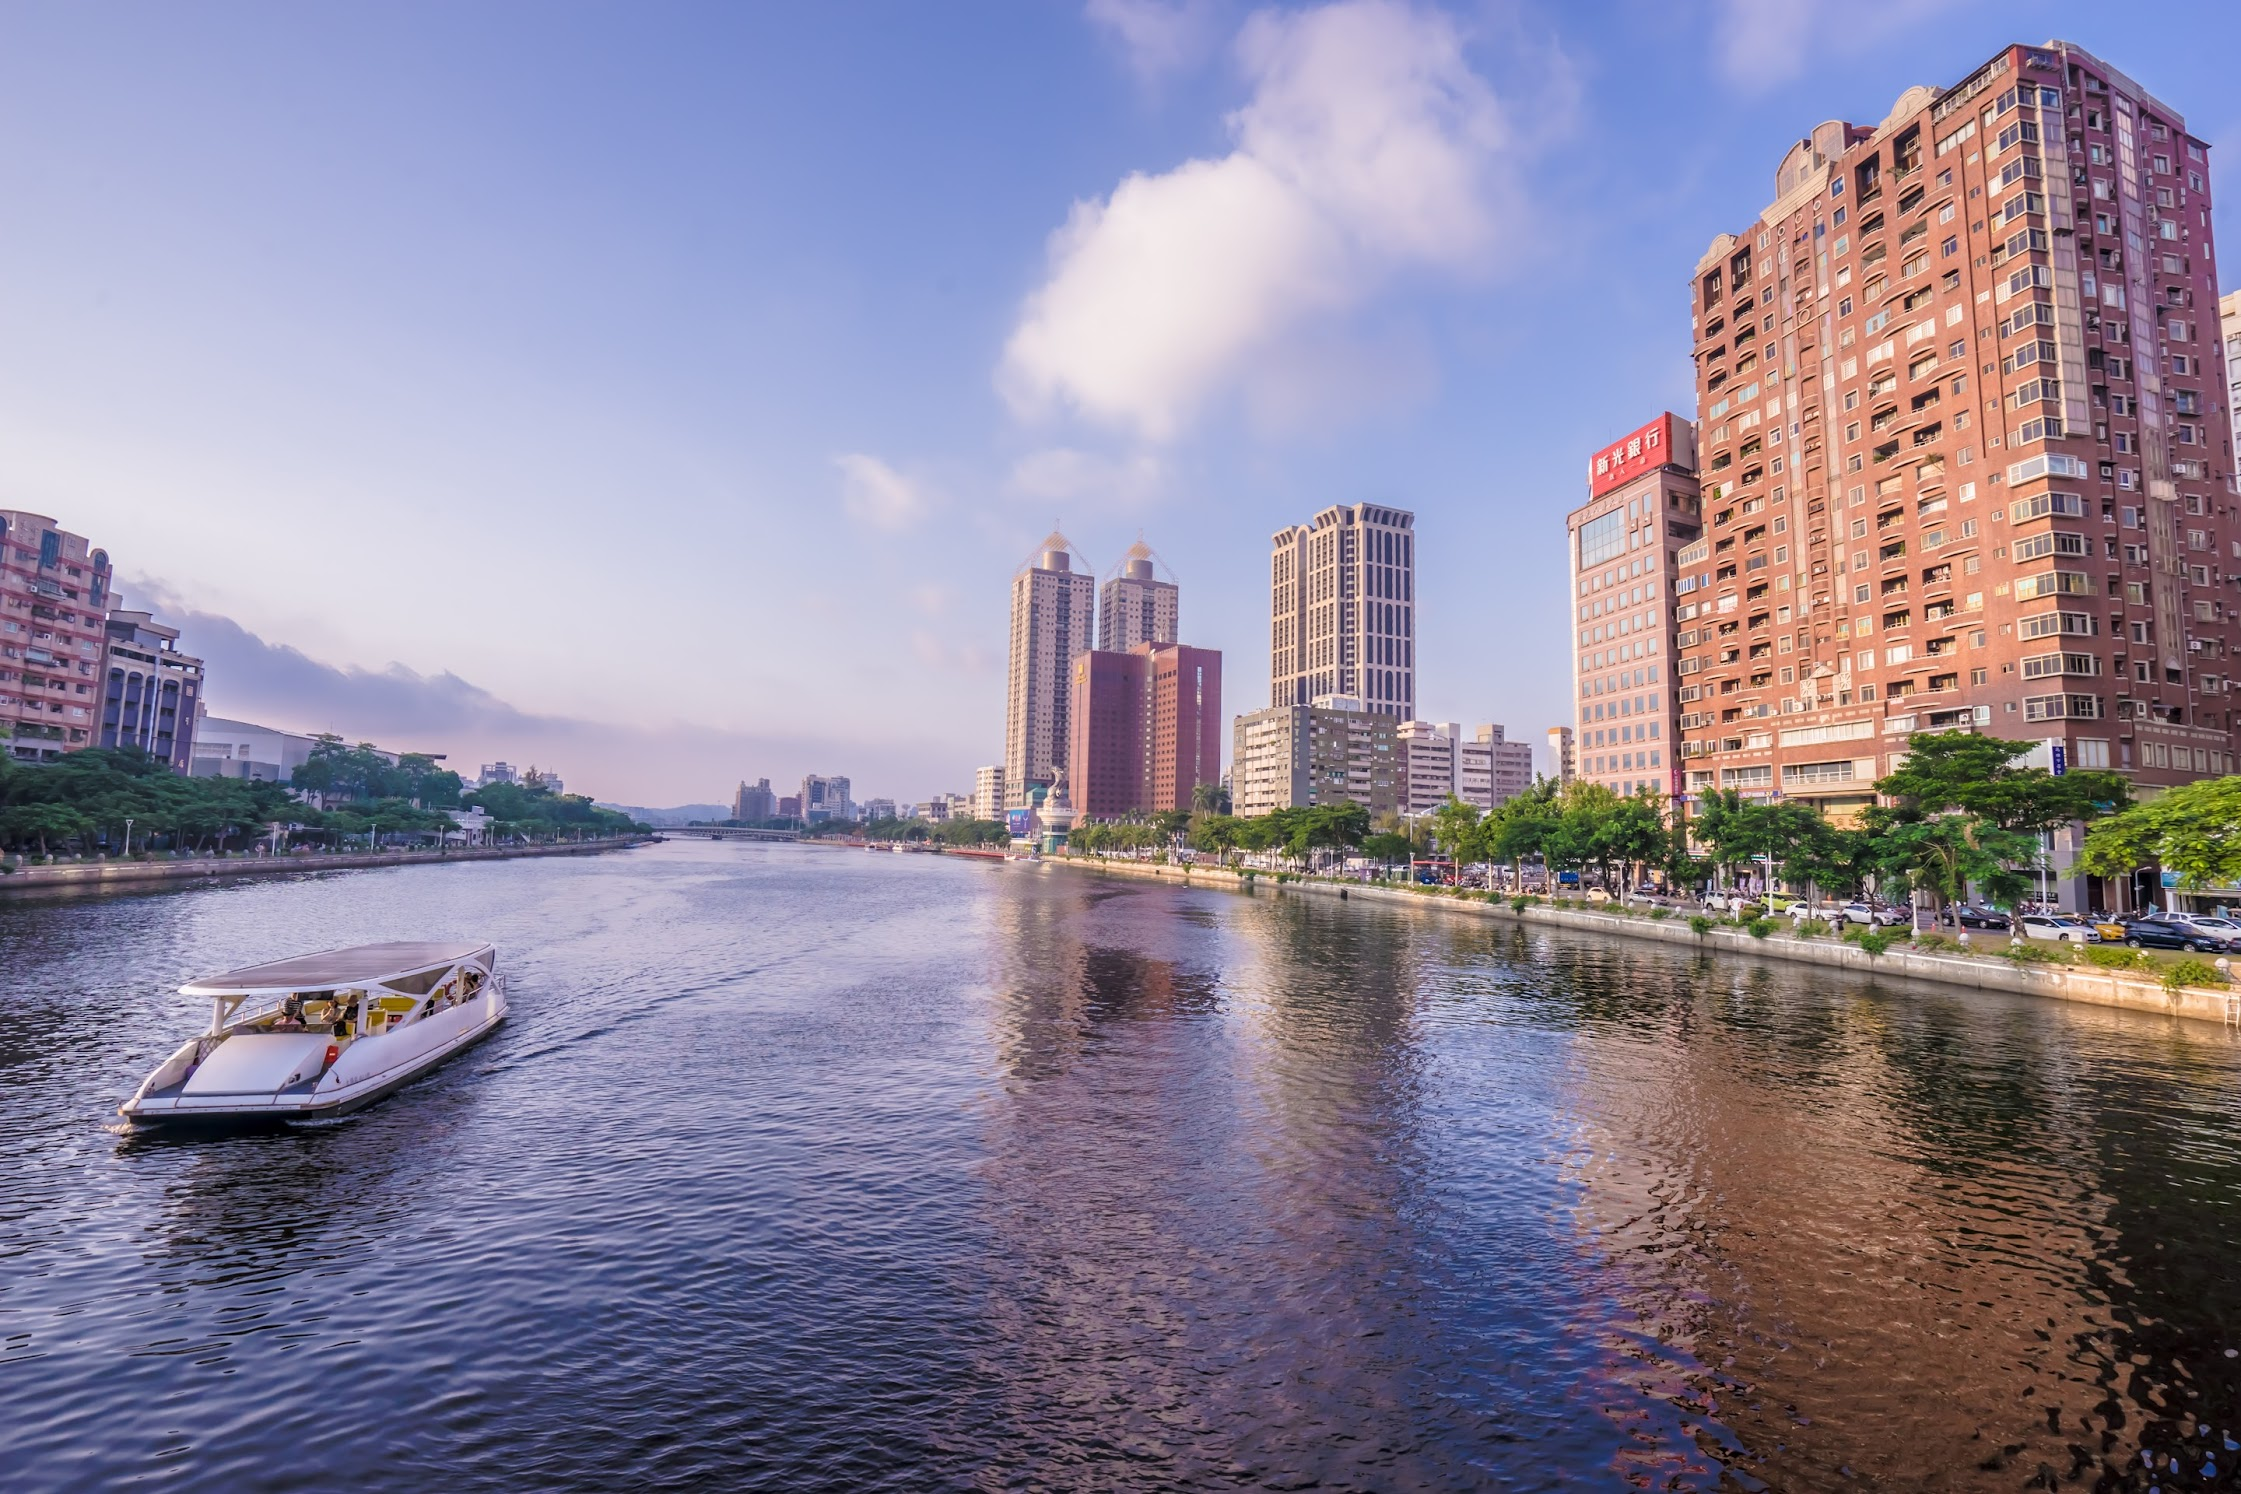 Taiwan Kaohsiung Love River2